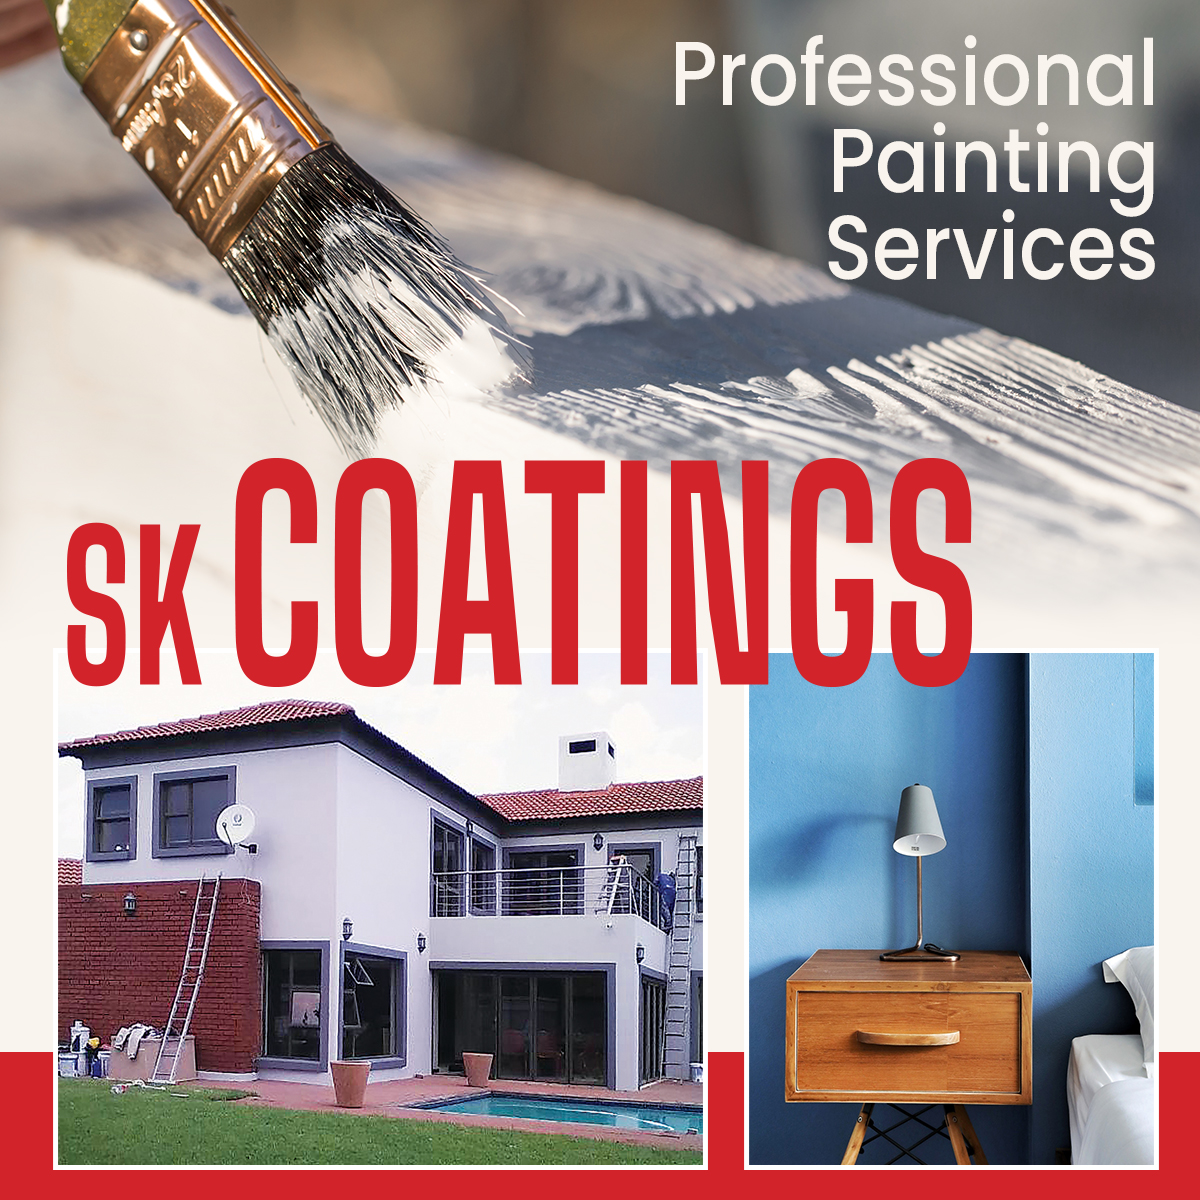 SK Coatings Painting Company Johannesburg